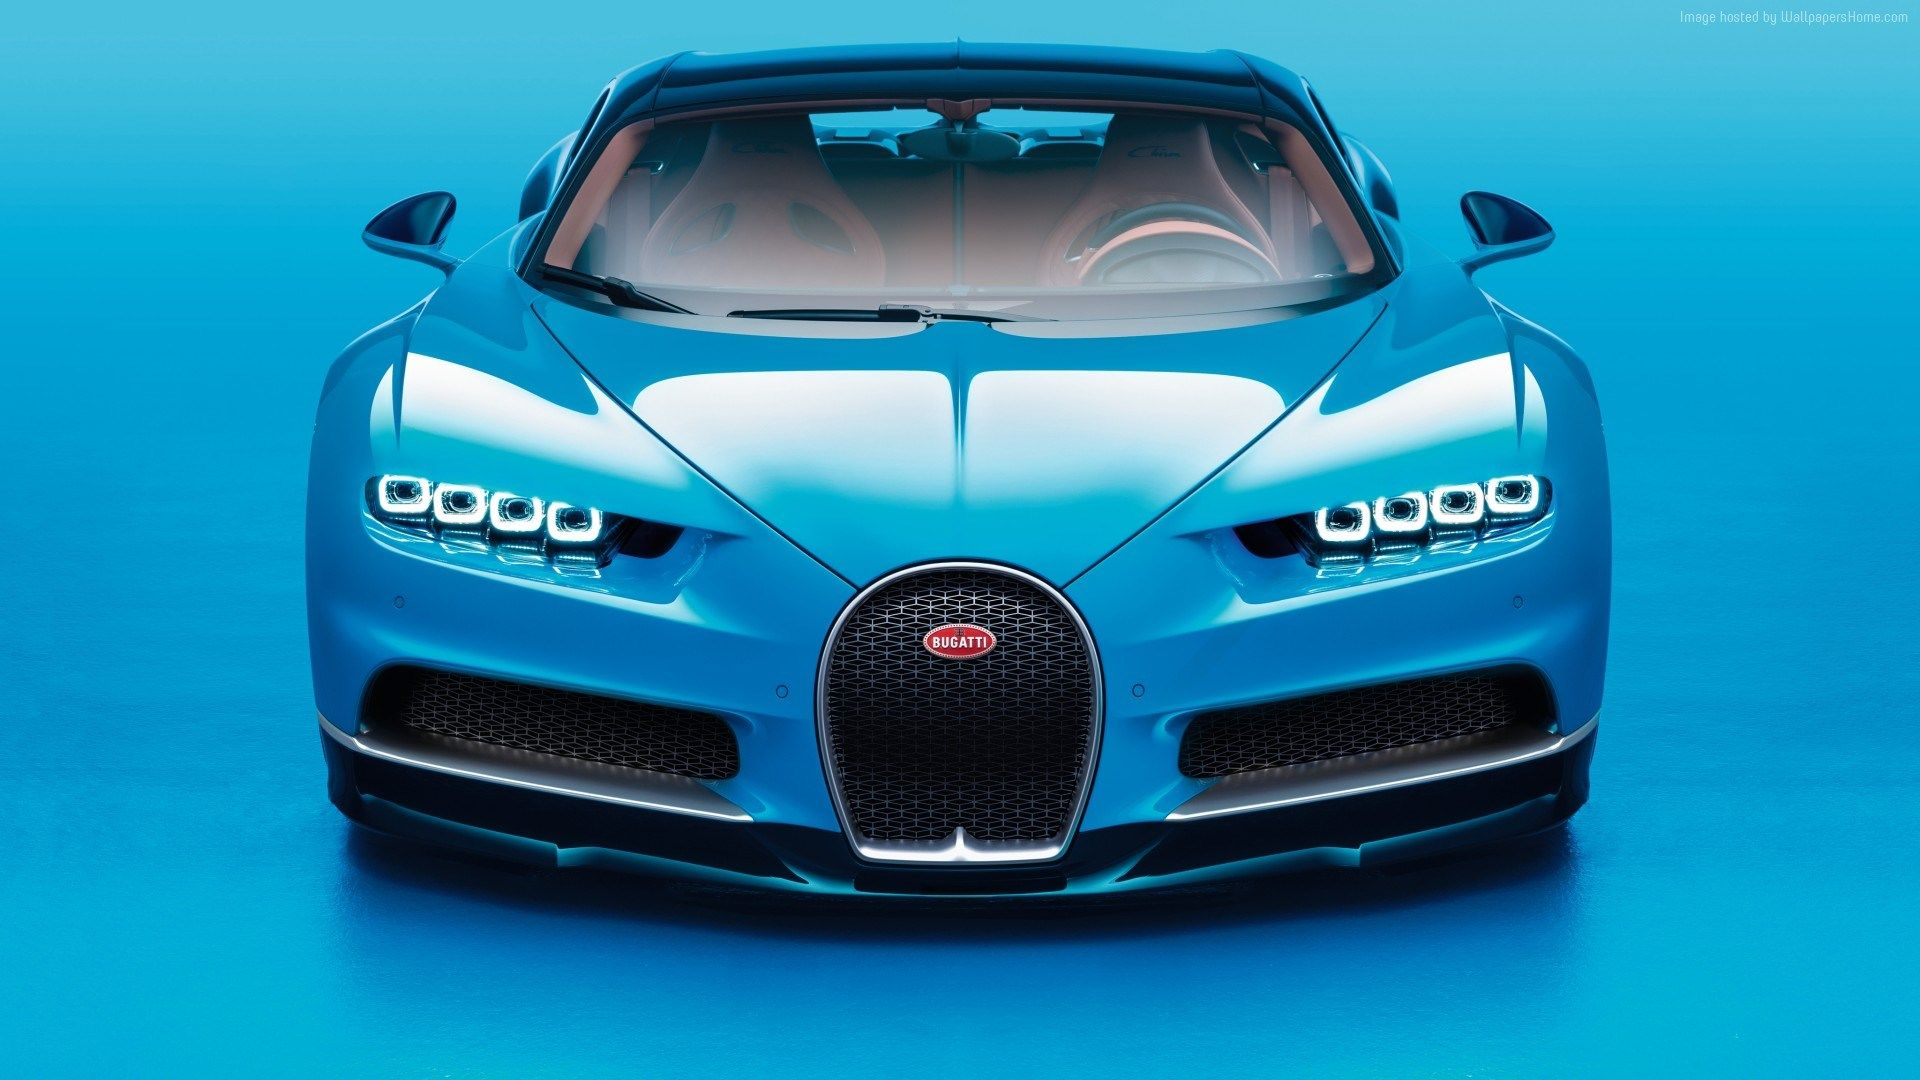 4702ed80f6cc7c34829b82250228ce0e Breathtaking Bugatti Veyron Black Bess Price Cars Trend